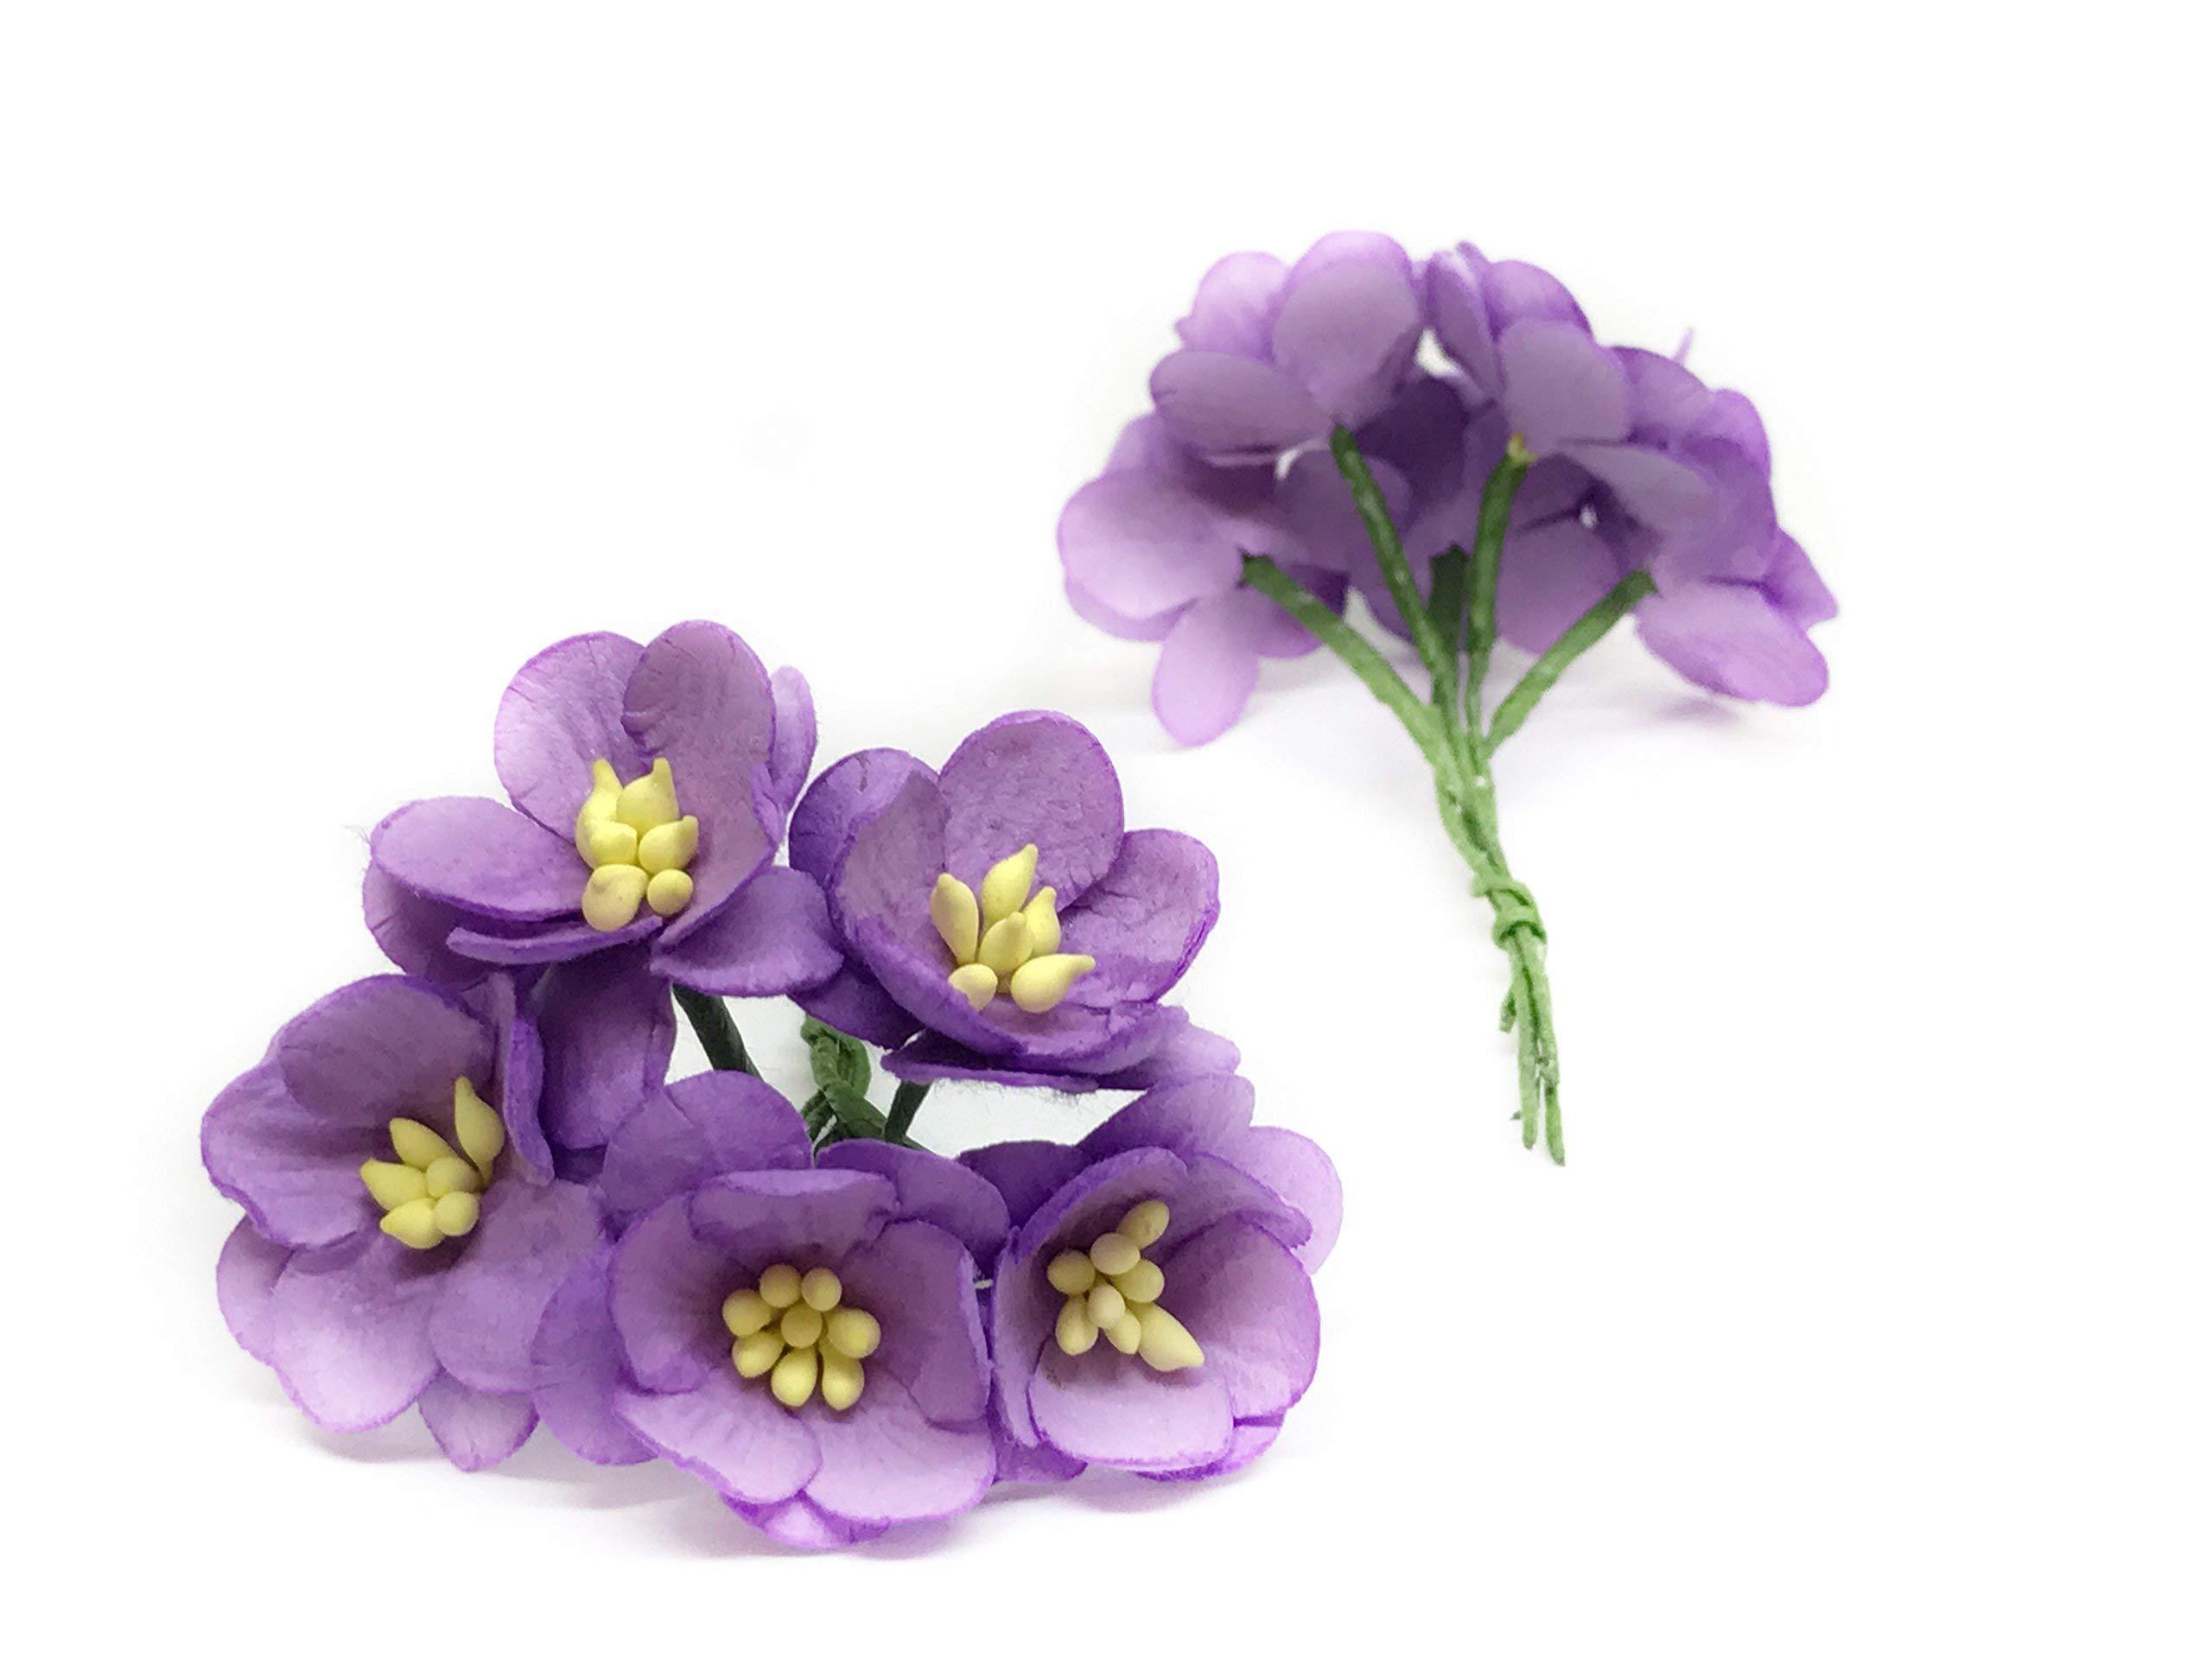 1-Purple-Cherry-Blossom-Flower-Artificial-Flowers-Paper-Flowers-Synthetic-Flowers-Fake-Flowers-Paper-Craft-Flowers-Mulberry-Paper-Flowers-Wedding-25-Pieces